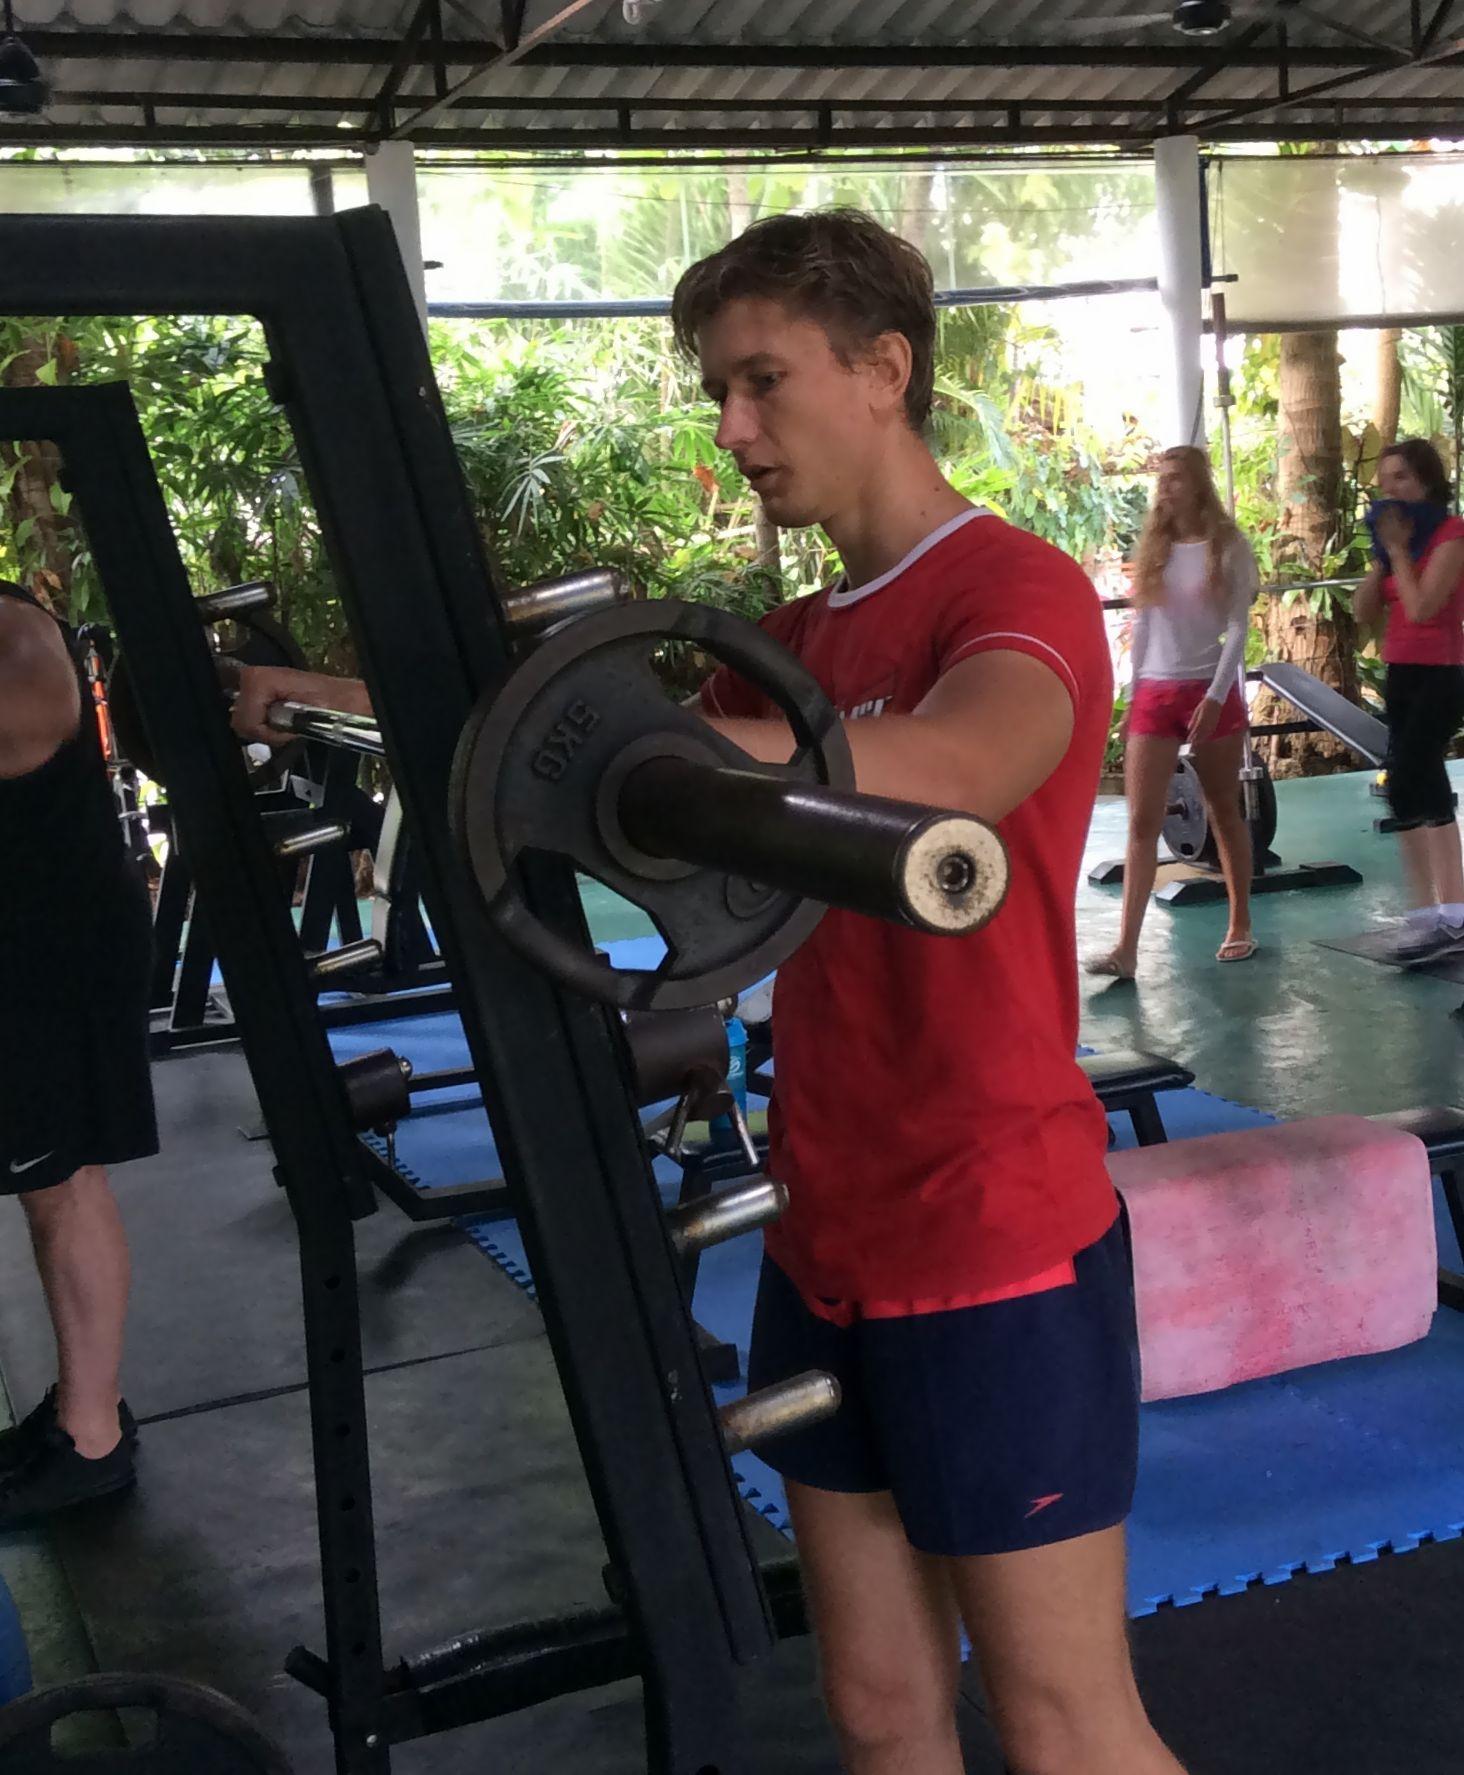 Artem-Mel'nik-fitnes-proekt-3-ja-nedelja-zanjatij-Артем-Мельник-фитнес-проект-3-я-неделя-занятий